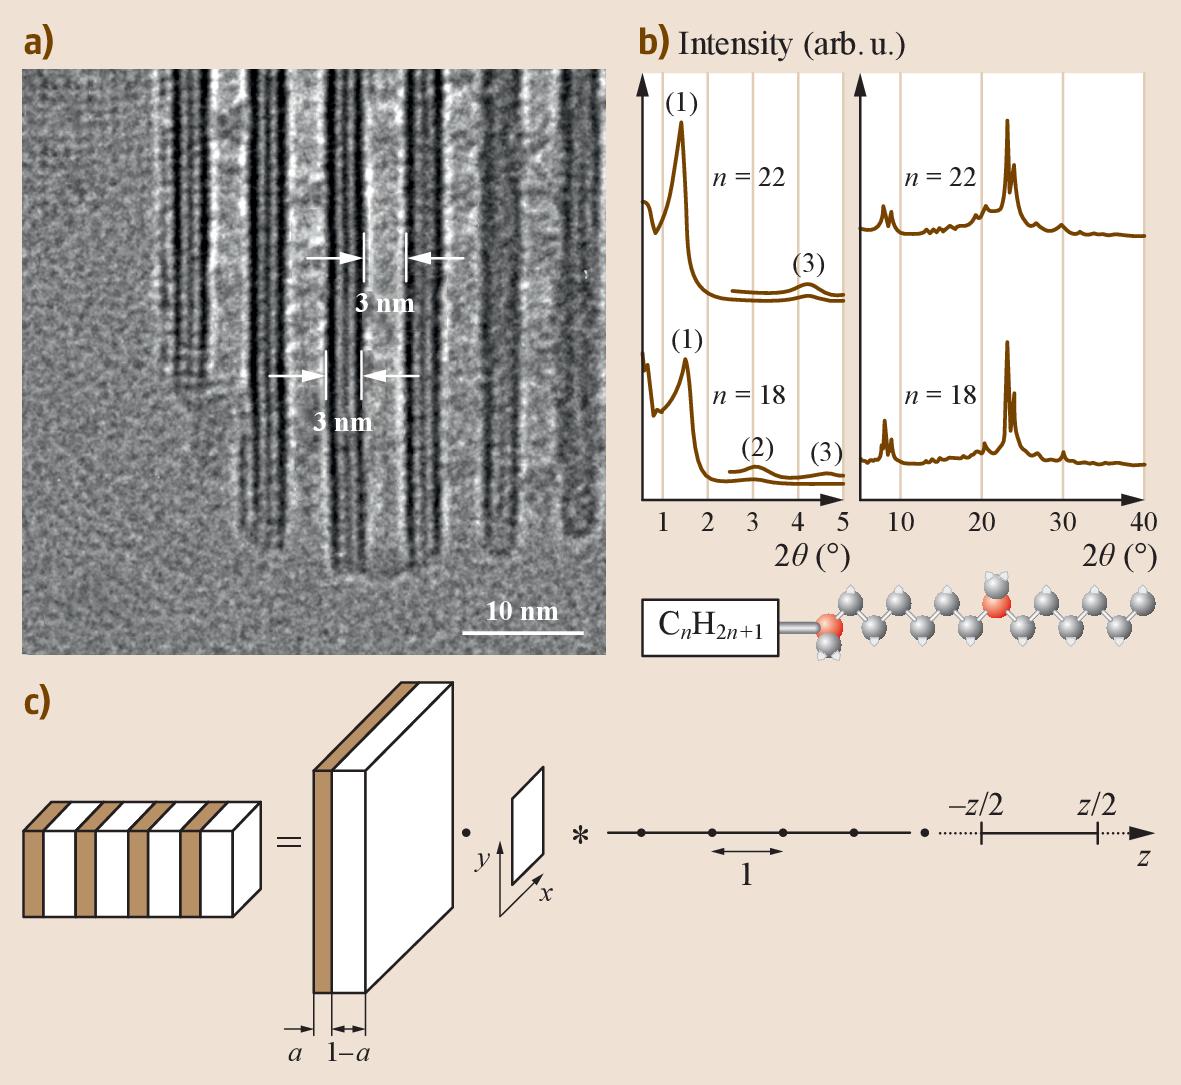 Microscopy of Nanoporous Crystals   SpringerLink on ddec ecm, detroit diesel diagram, ddec 5 sensor harness, ddec 3 codes, detroit series 60 ecm resistor diagram, ddec flash codes, retrosound model 2wire diagram, ddec v wiring, ddec ii, ottawa model diagram, ddec 3 wiring kits, ottawa yard truck dash diagram, ddec iii electric diagram,